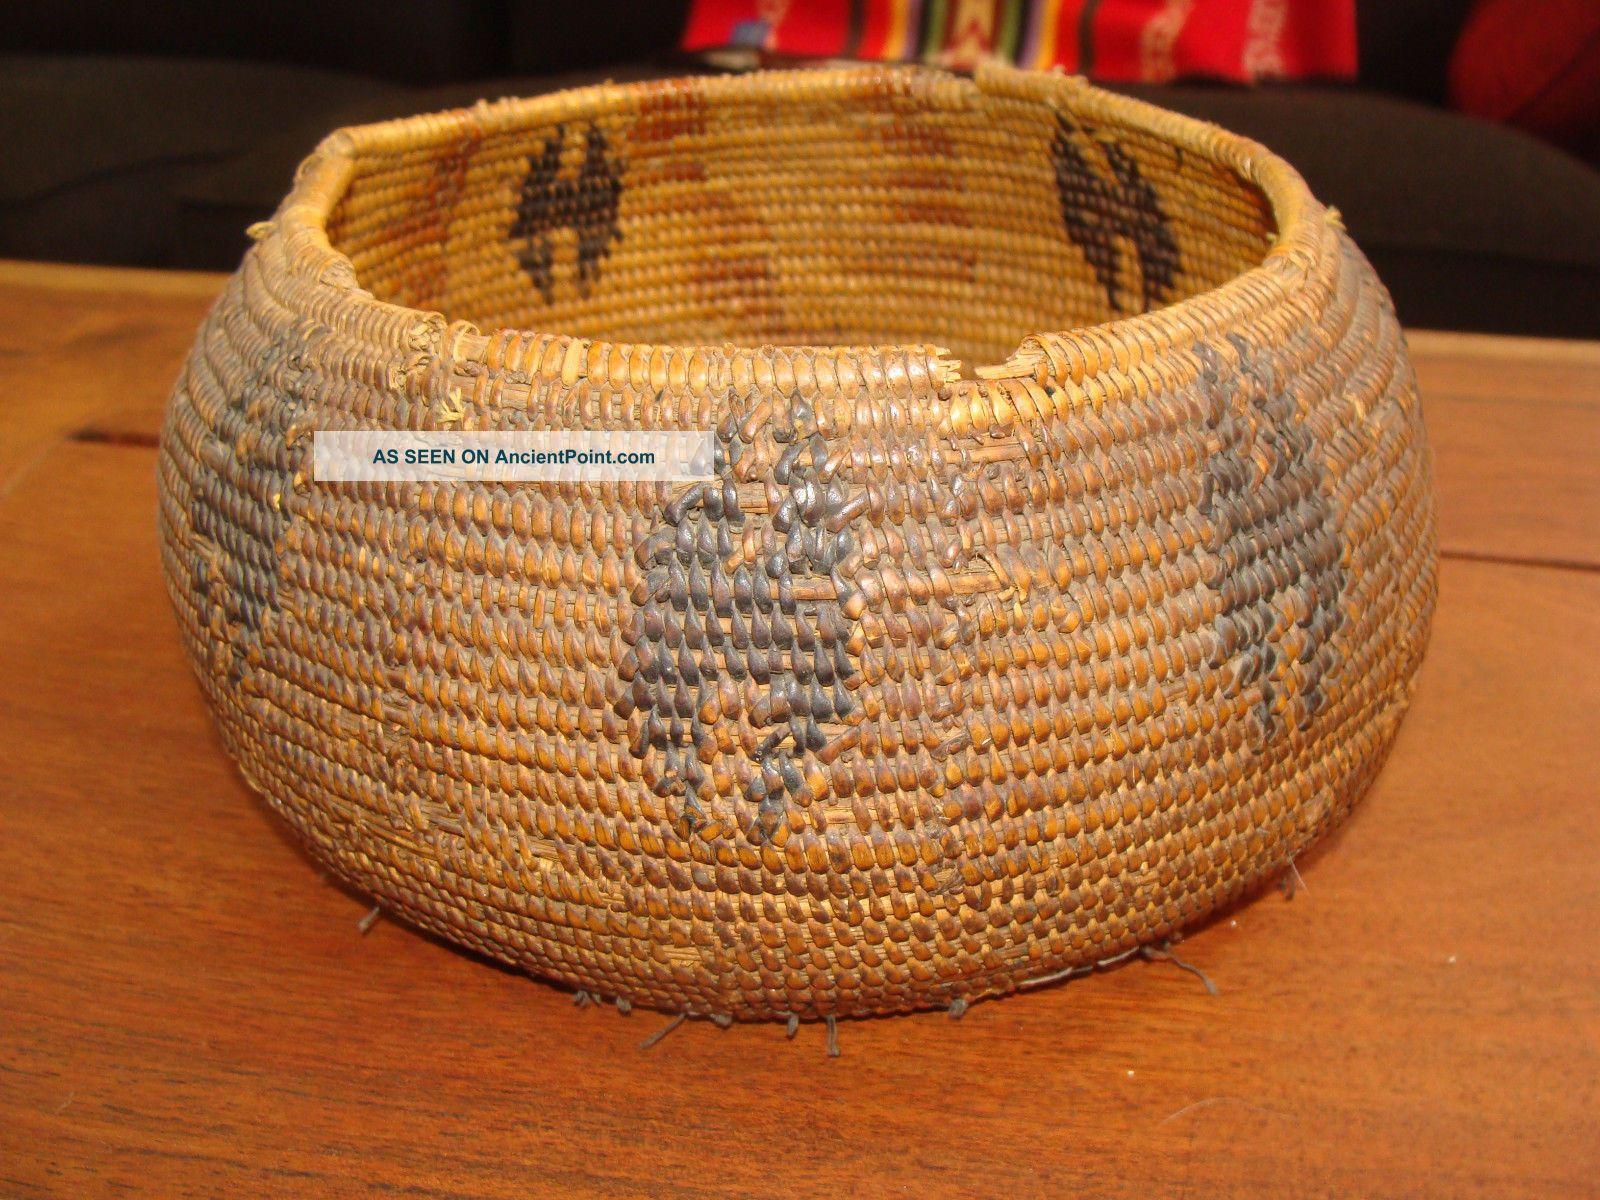 Rare Large Globular Native Use Pomo California Native American Indian Basket Native American photo